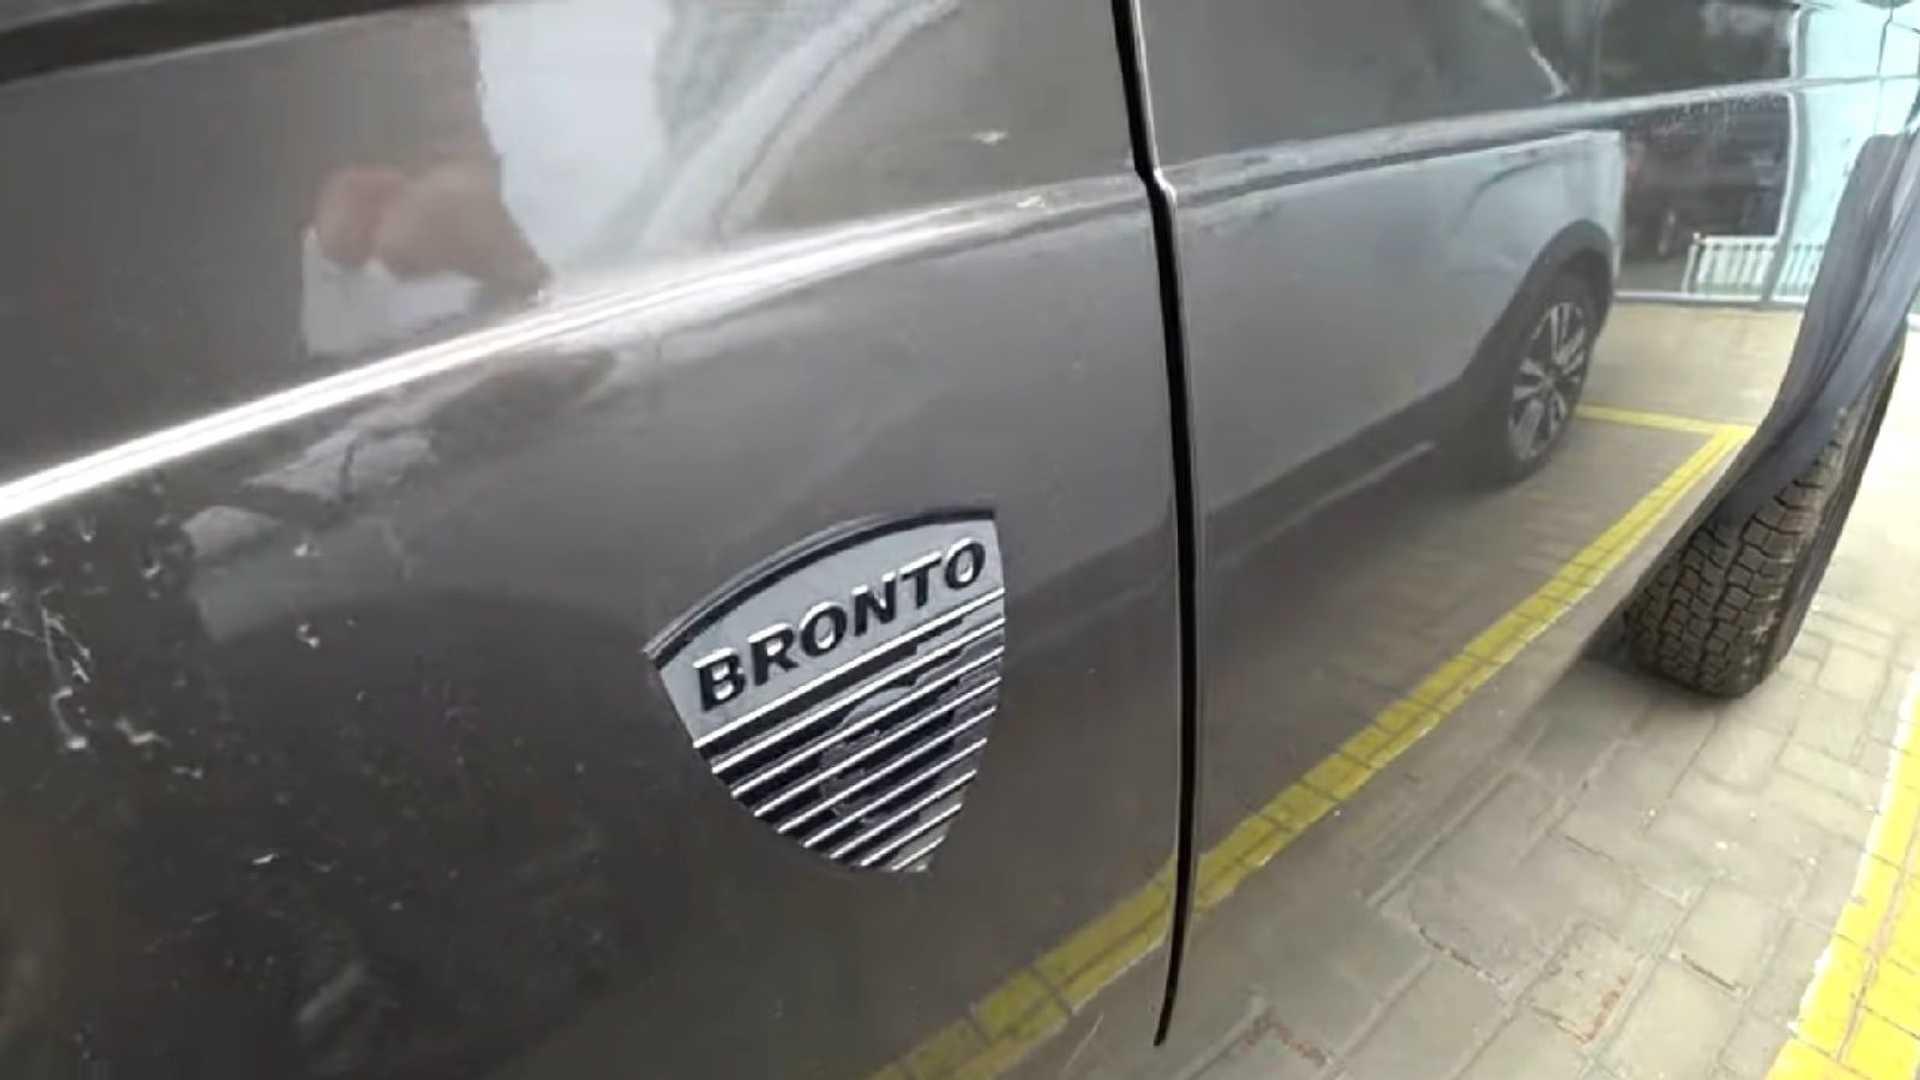 Niva Bronto